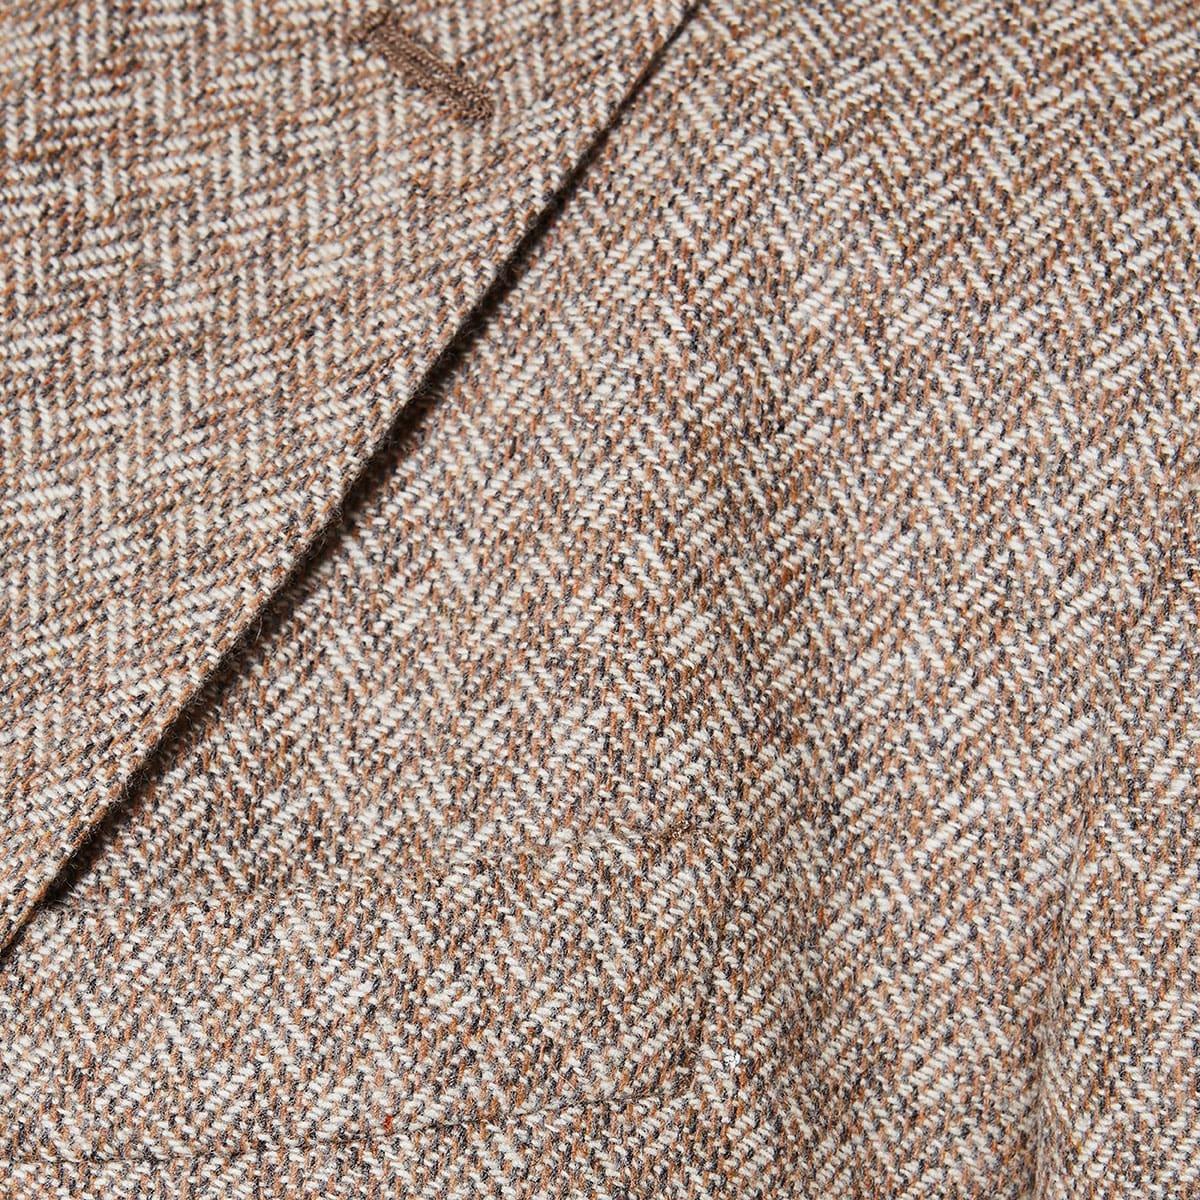 Single-breasted tweed blazer